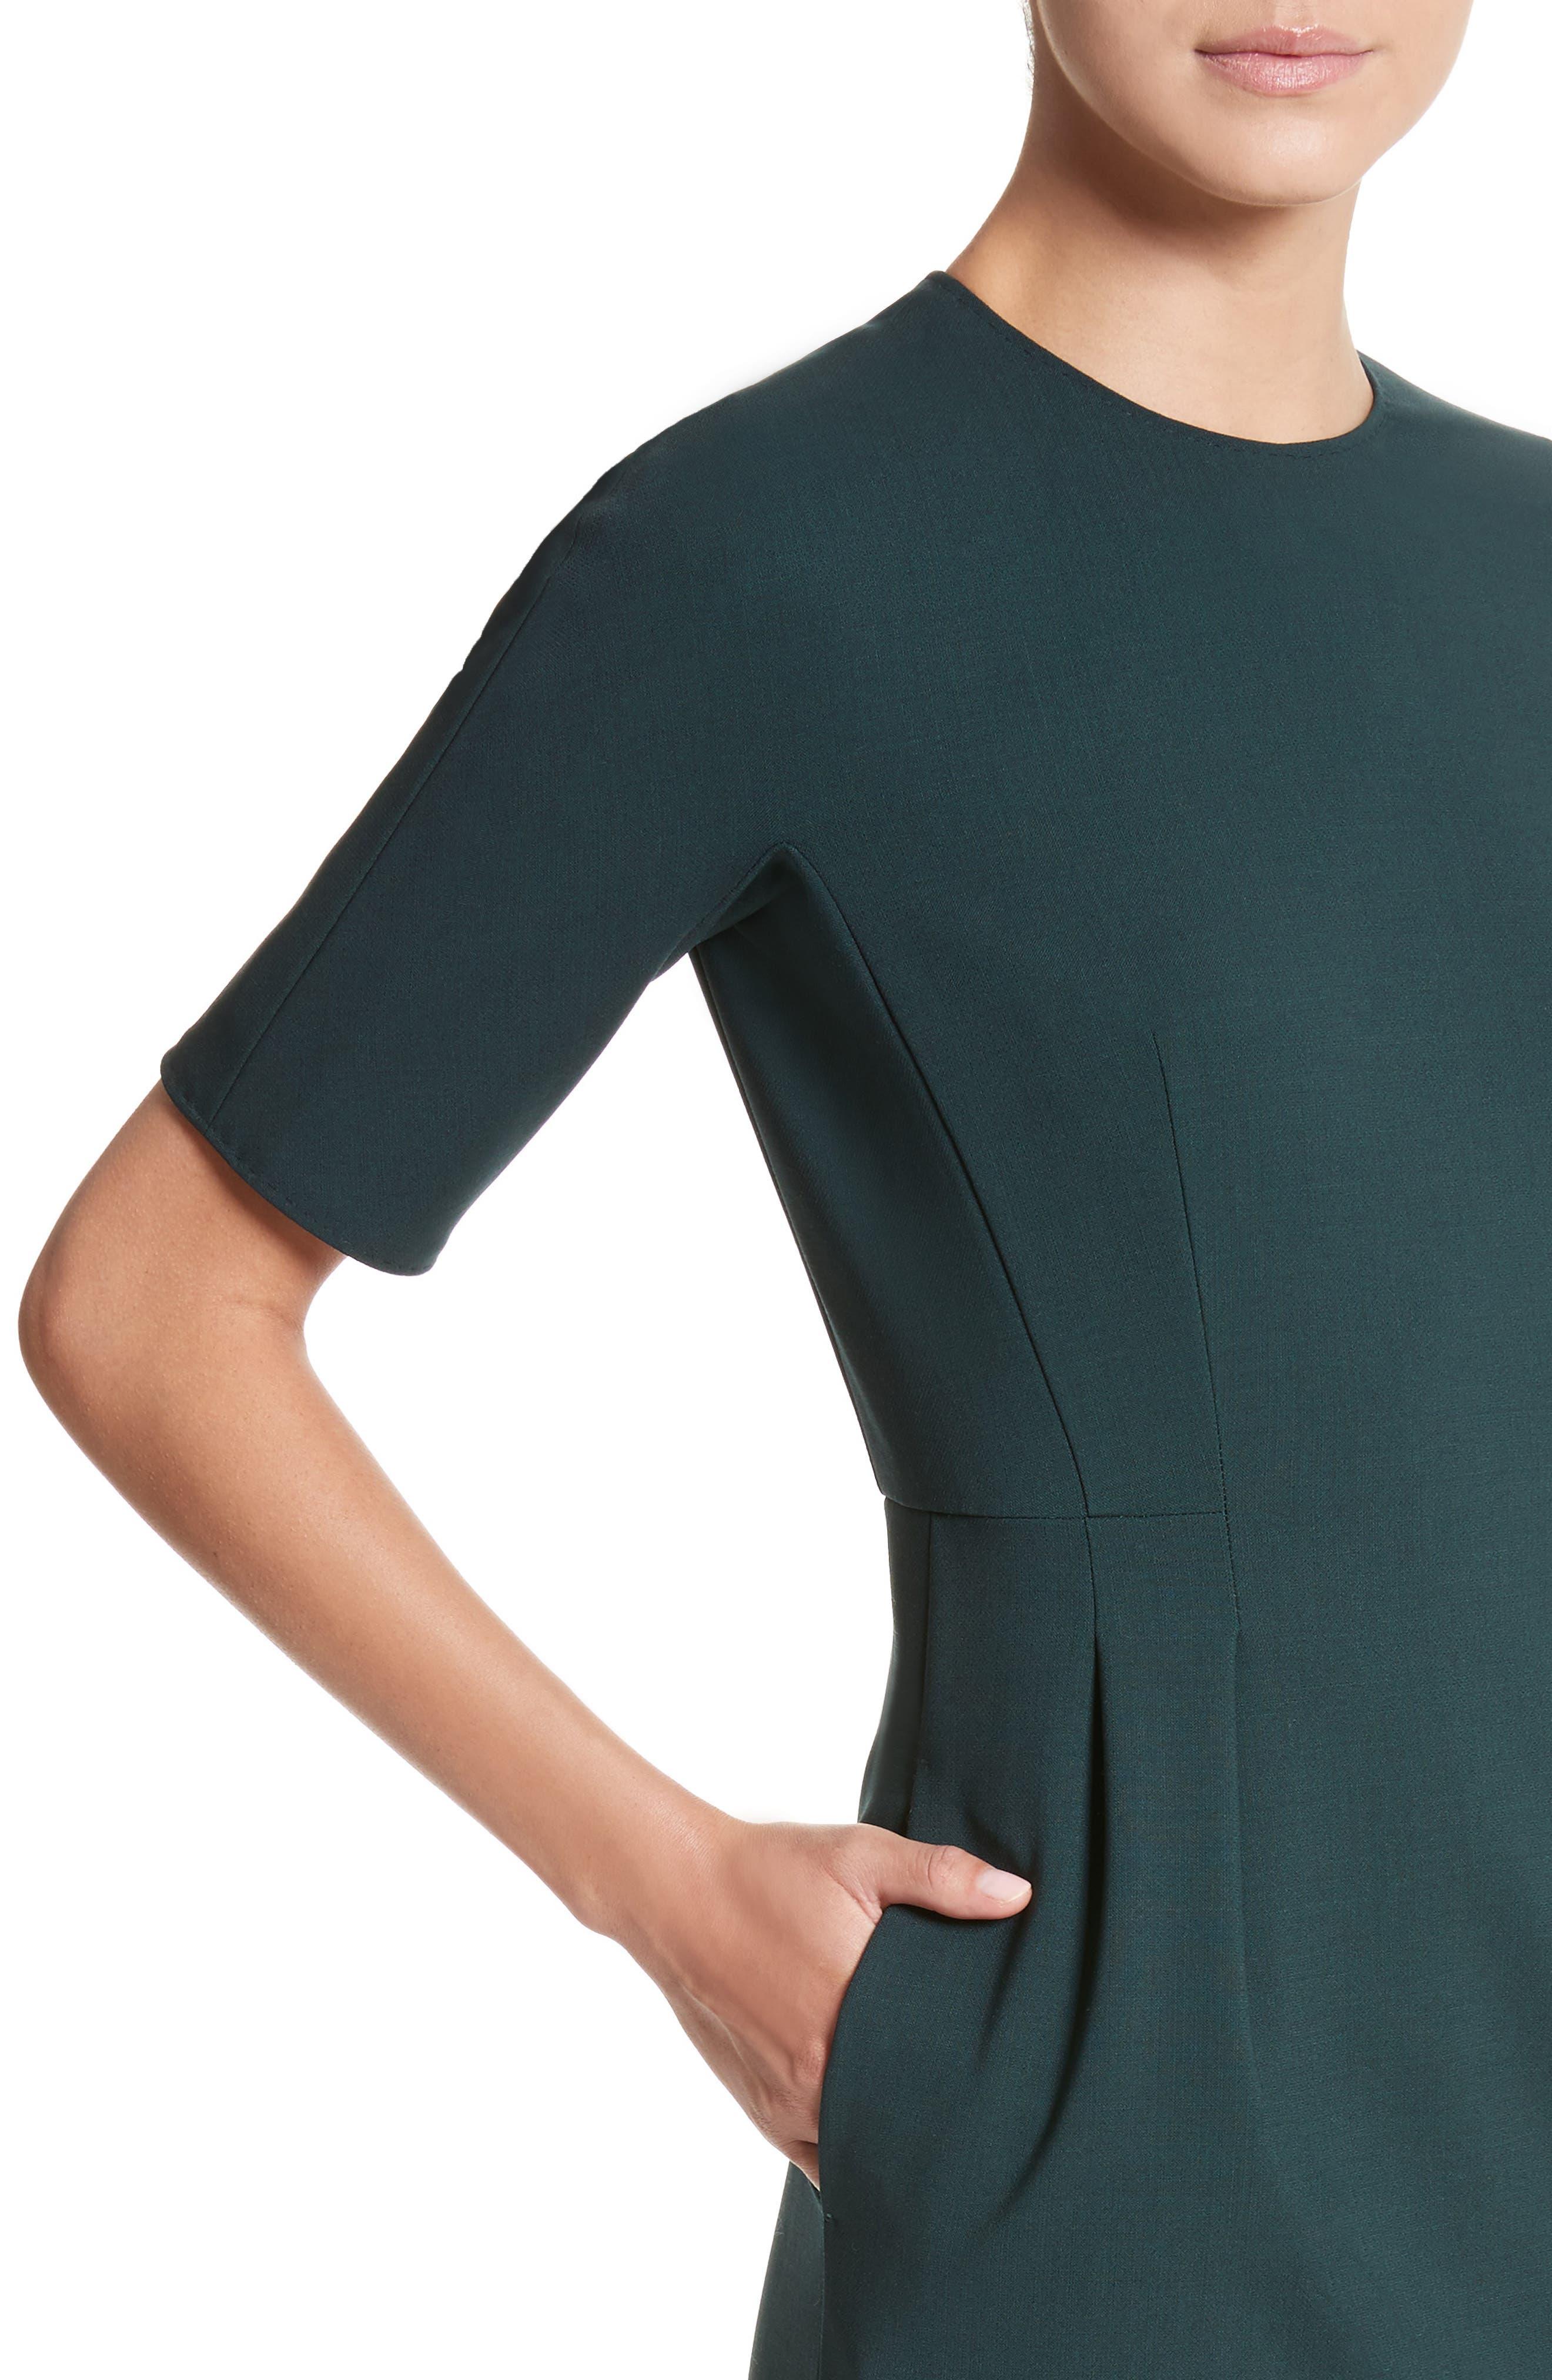 Umano Stretch Wool Sheath Dress,                             Alternate thumbnail 4, color,                             304